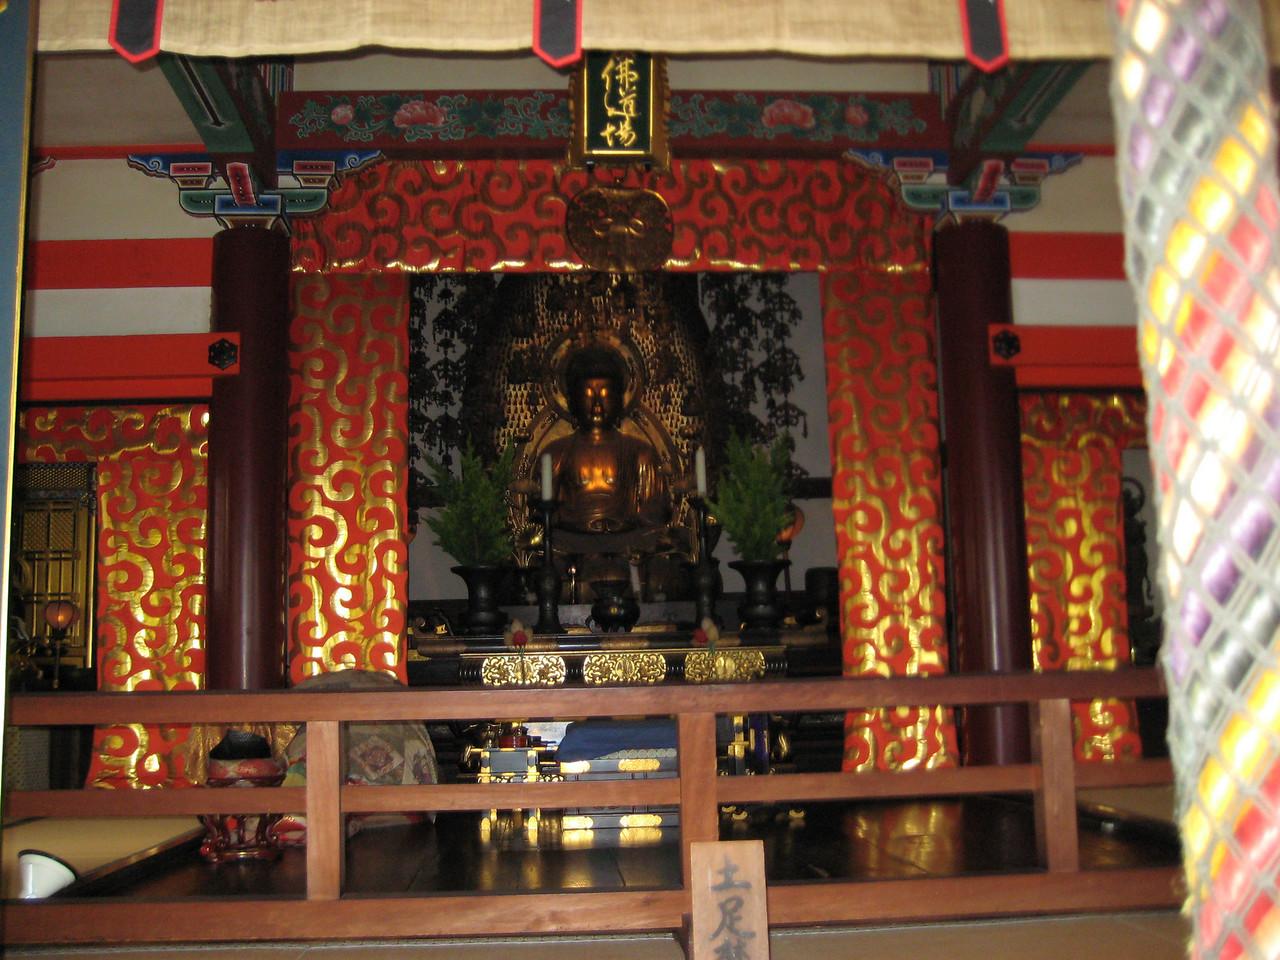 Amida-Do, the Amida Hall with the image of Amida Nyorai, Buddha of Infinite Wisdom and Compassion